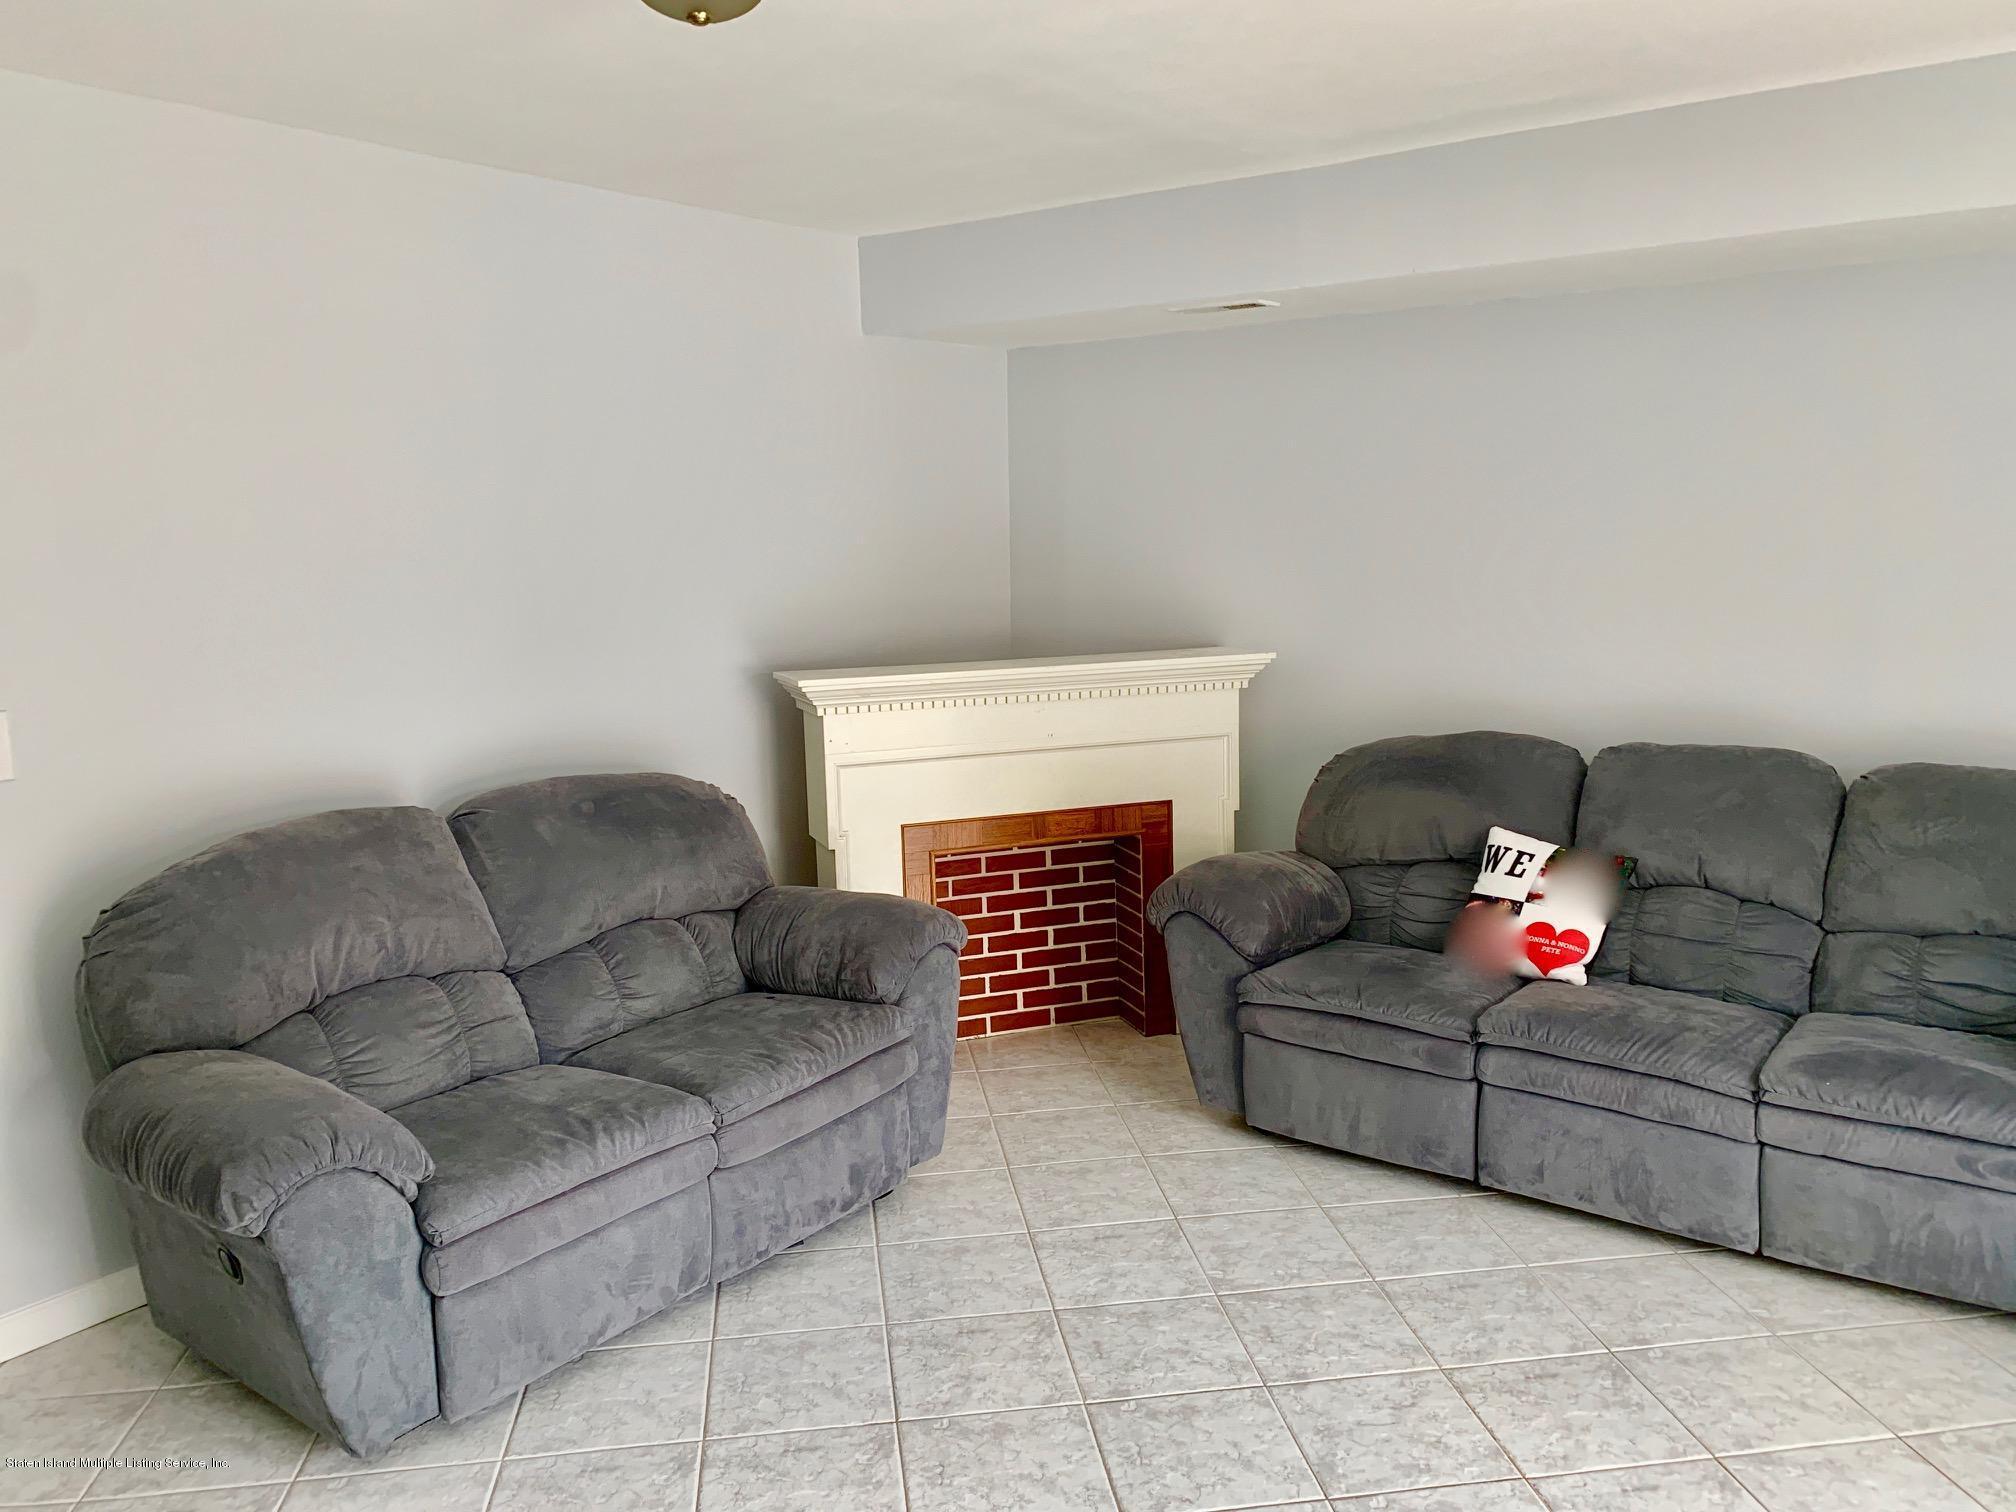 Single Family - Attached 99 Cedar Grove   Staten Island, NY 10306, MLS-1132231-15